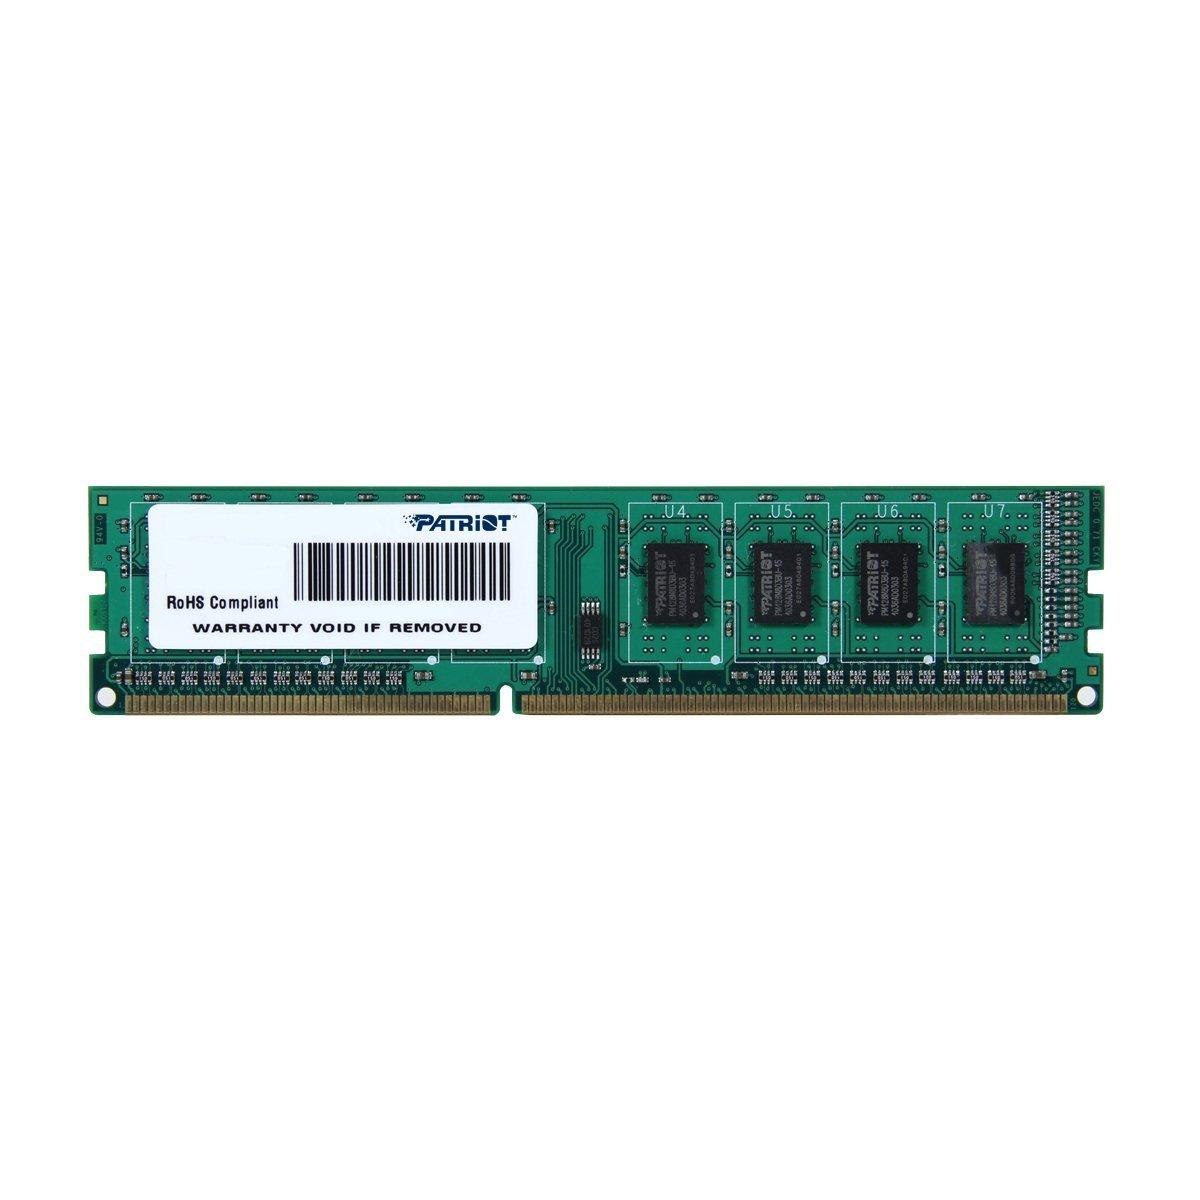 PATRIOT SIGNATURE DDR3 4GB PC3-10600 (1333MHZ) CL9 DIMM operatīvā atmiņa